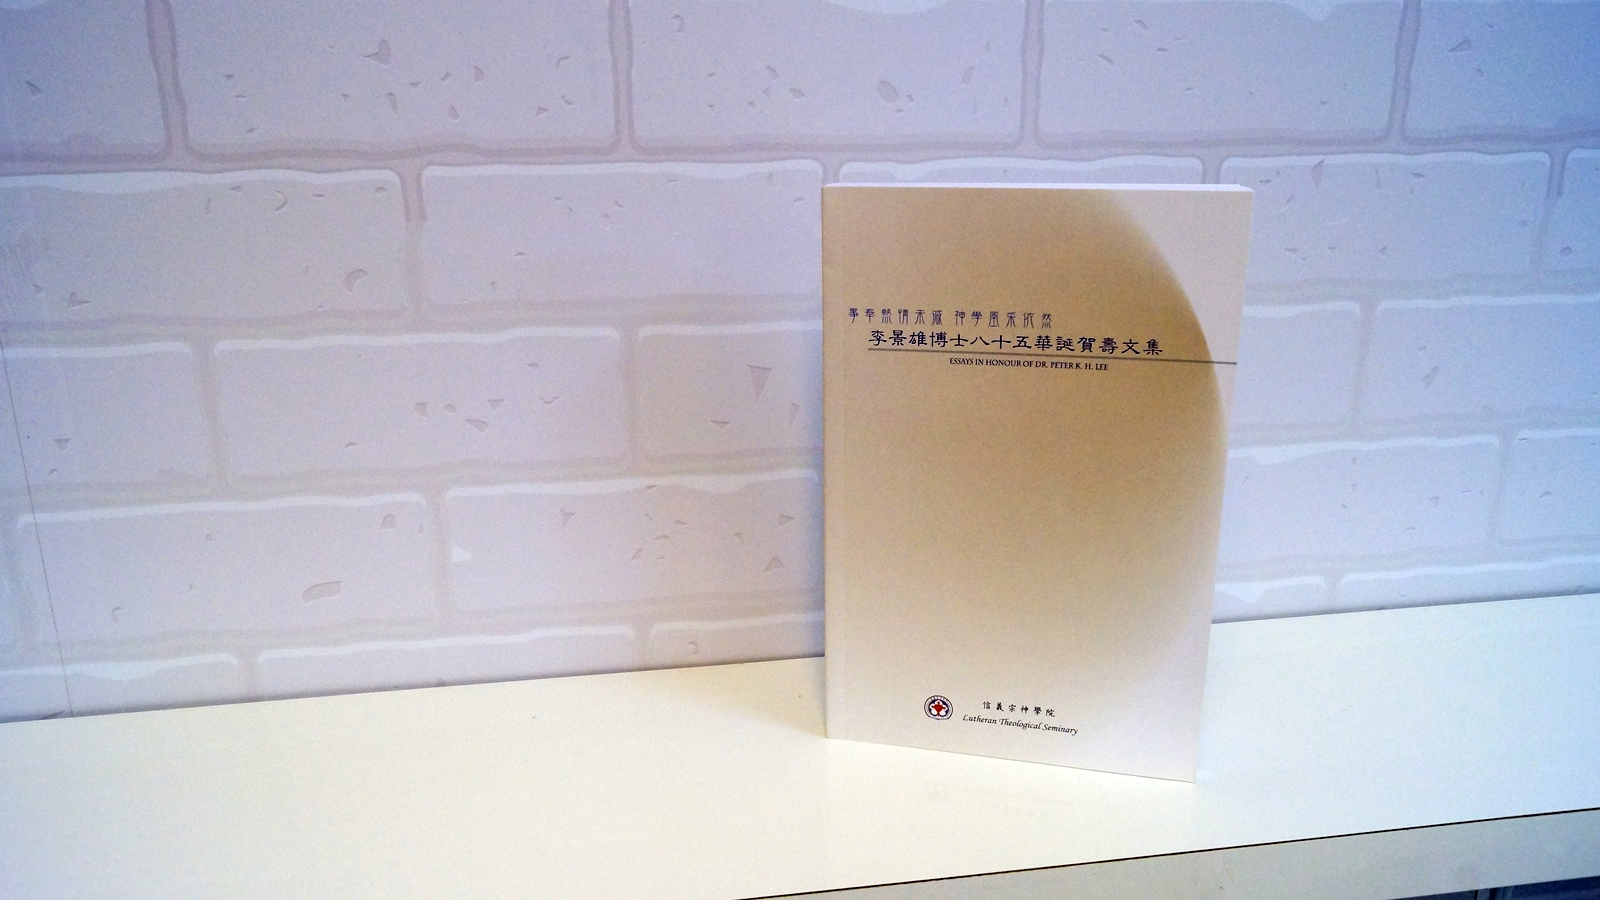 ta-14-essays-in-honour-of-dr-petter-k-h-lee-goodbook